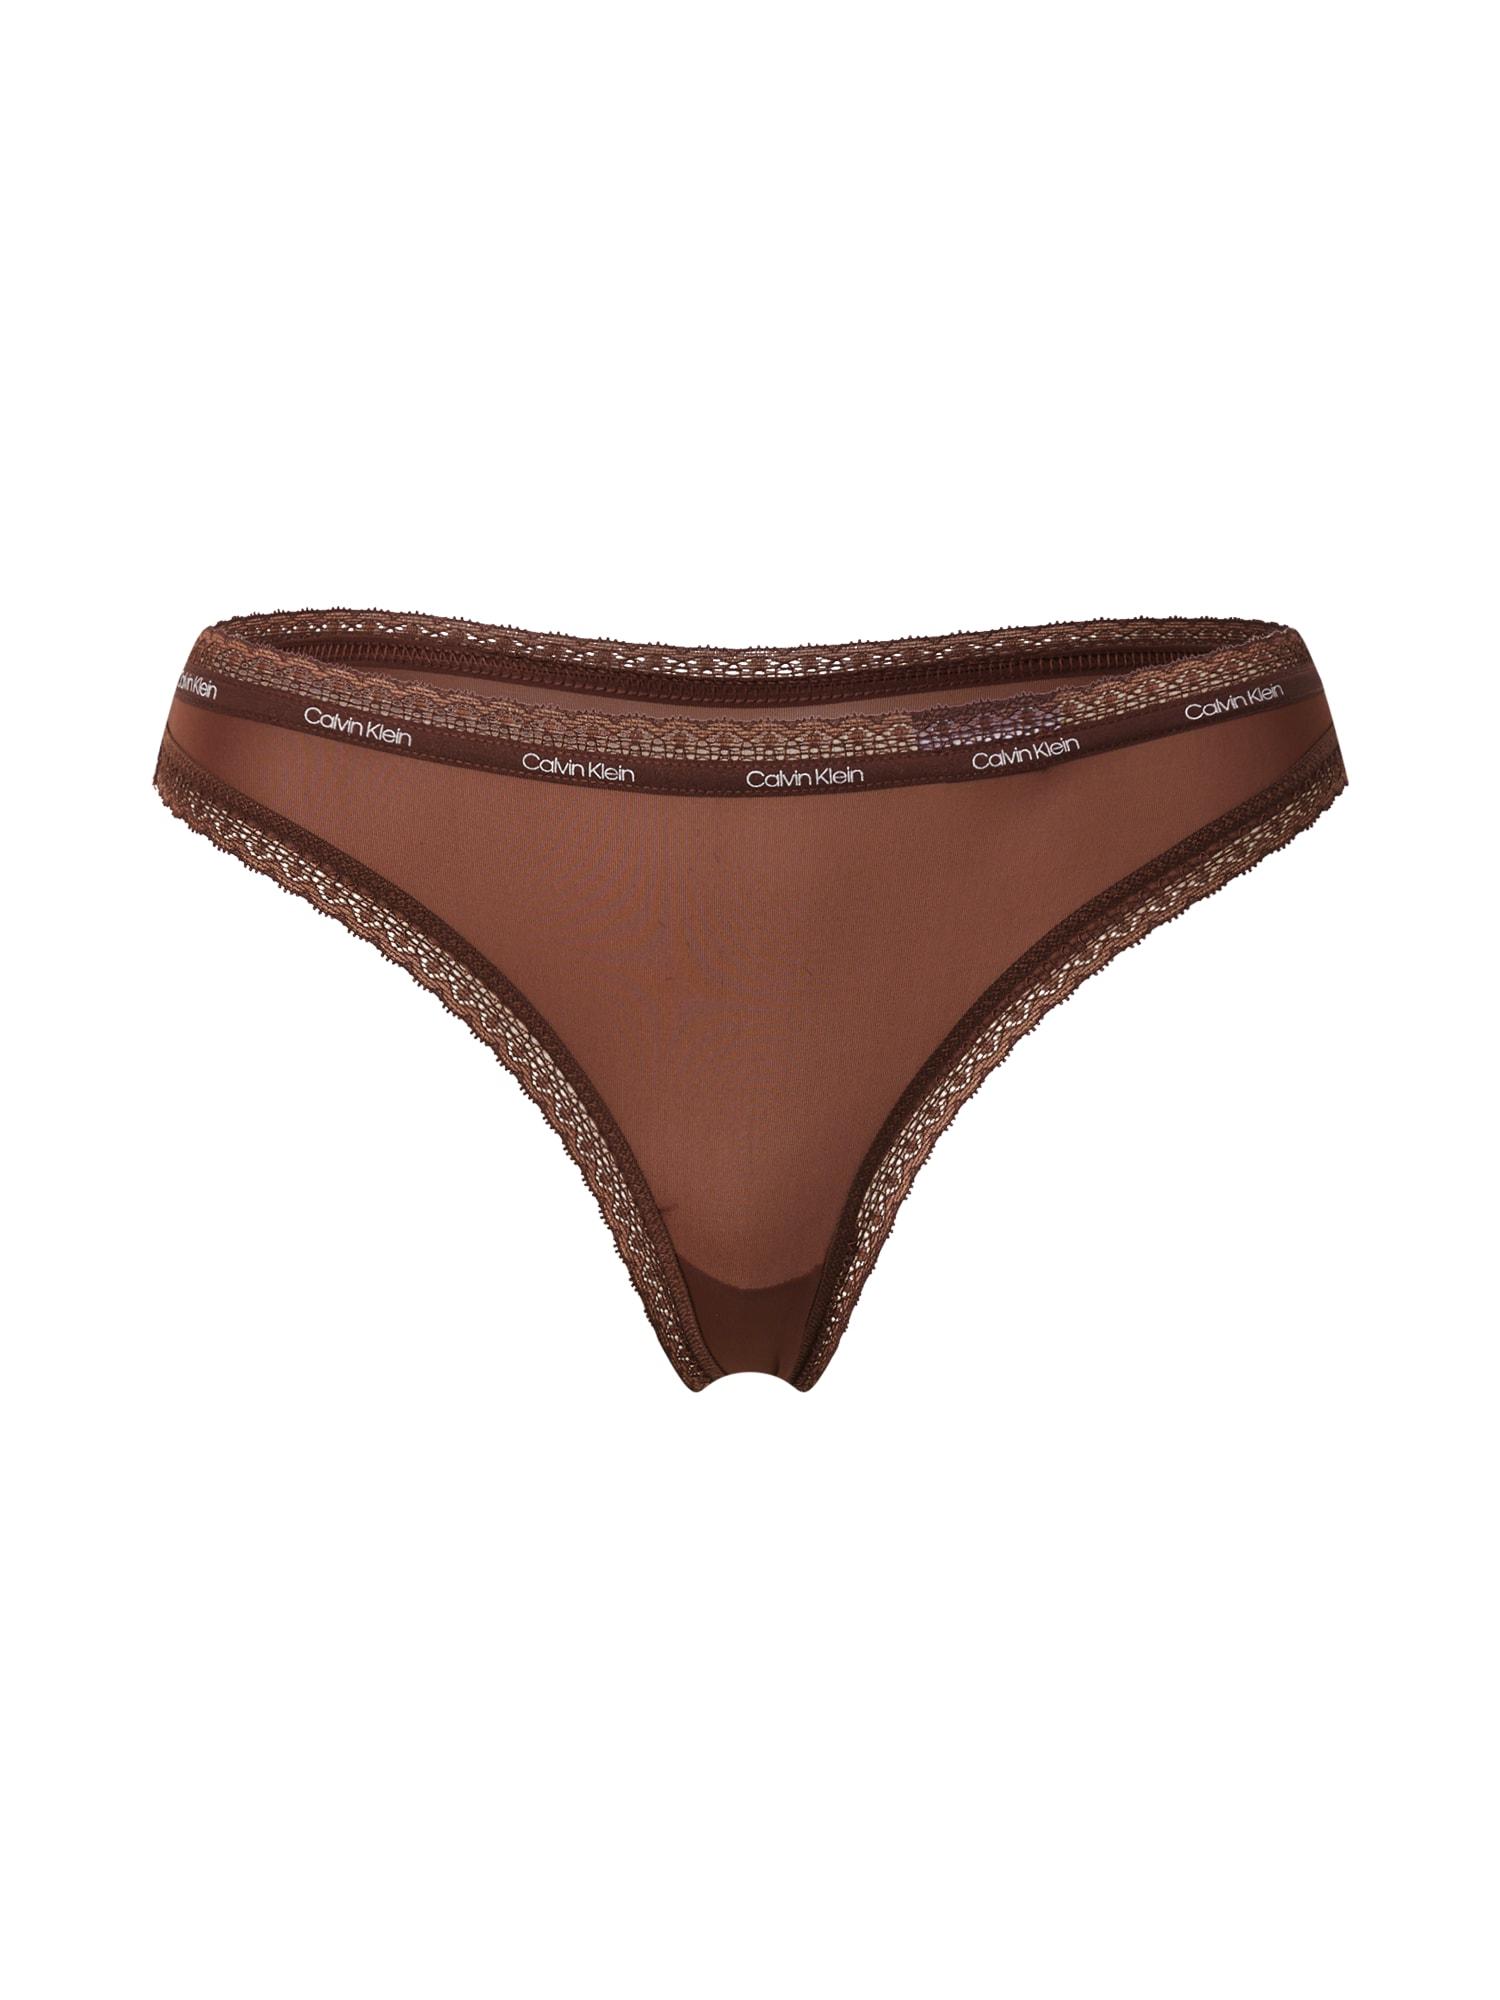 Calvin Klein Underwear Siaurikės tamsiai ruda / balta